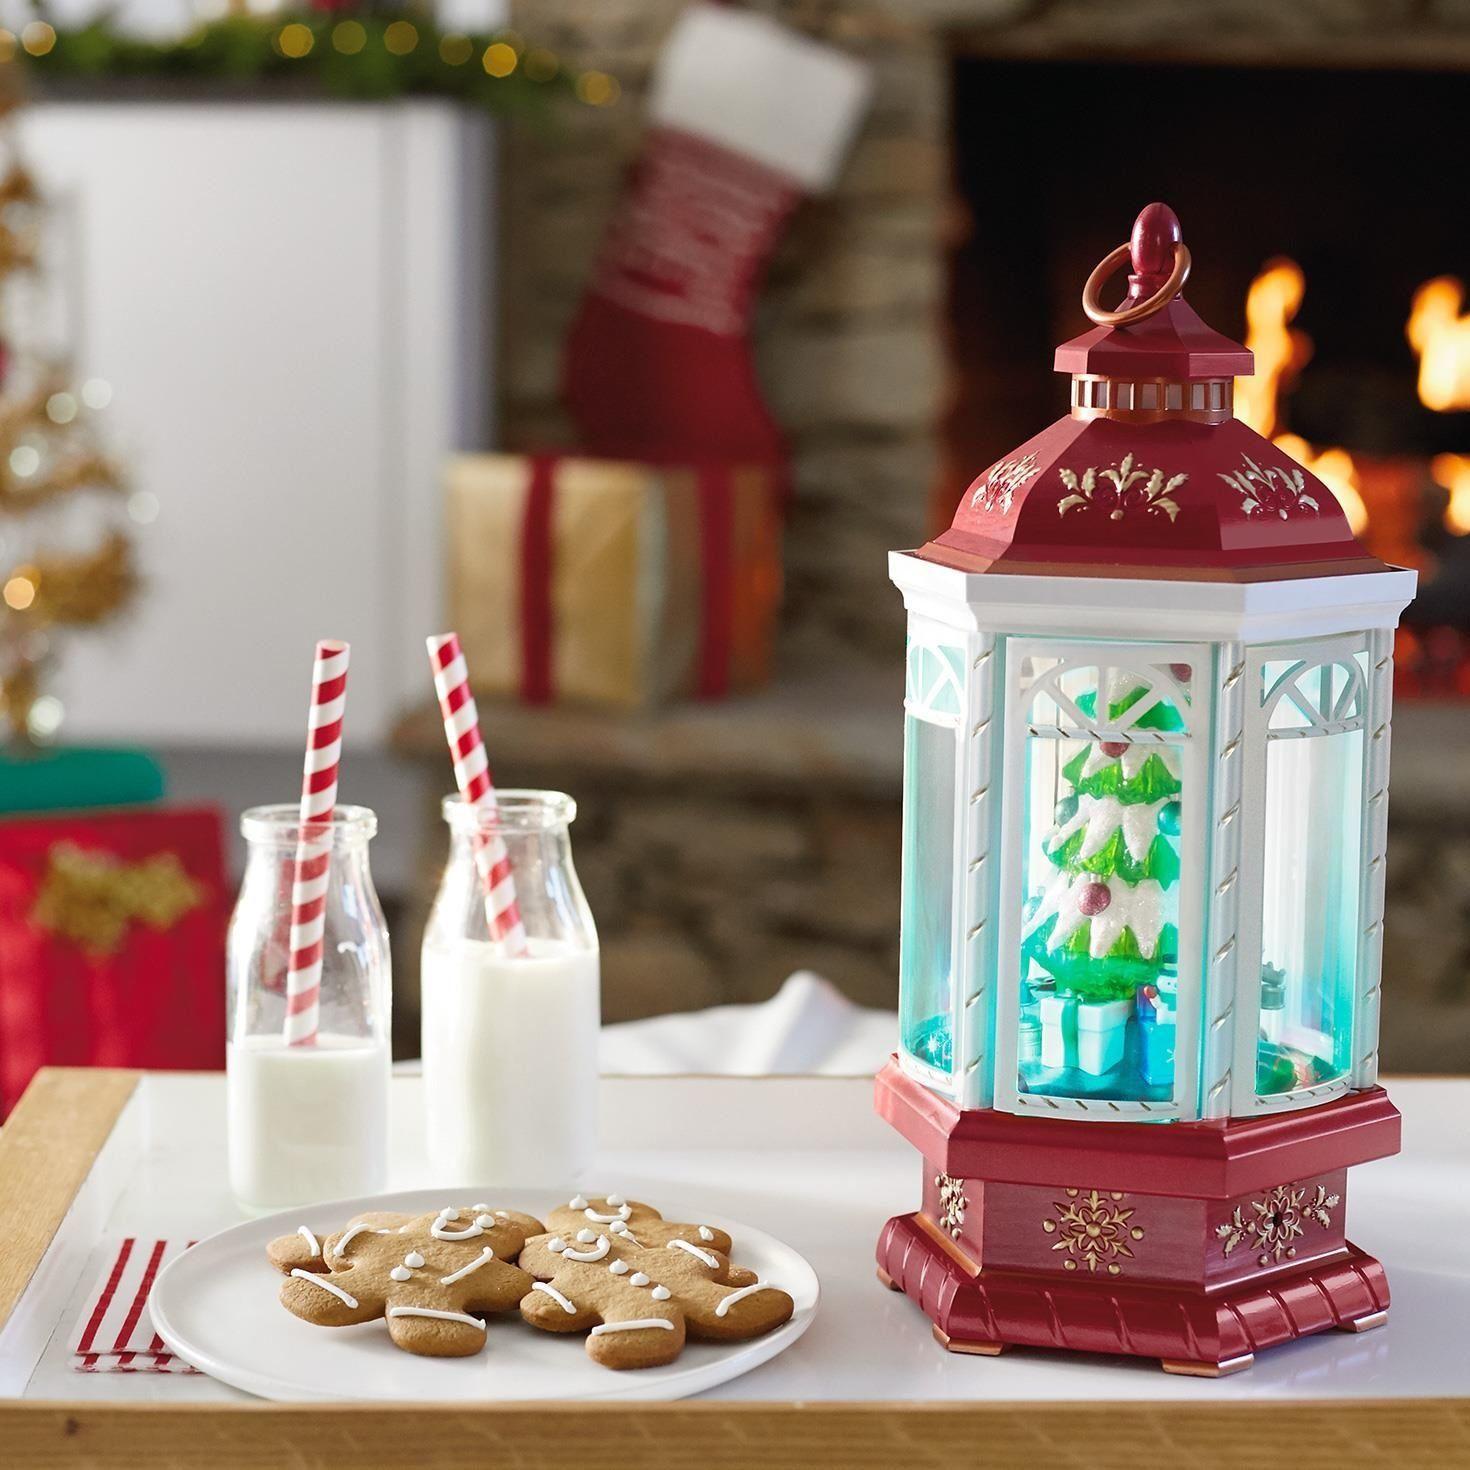 Hallmark Christmas Lantern Table Decoration With Light ...